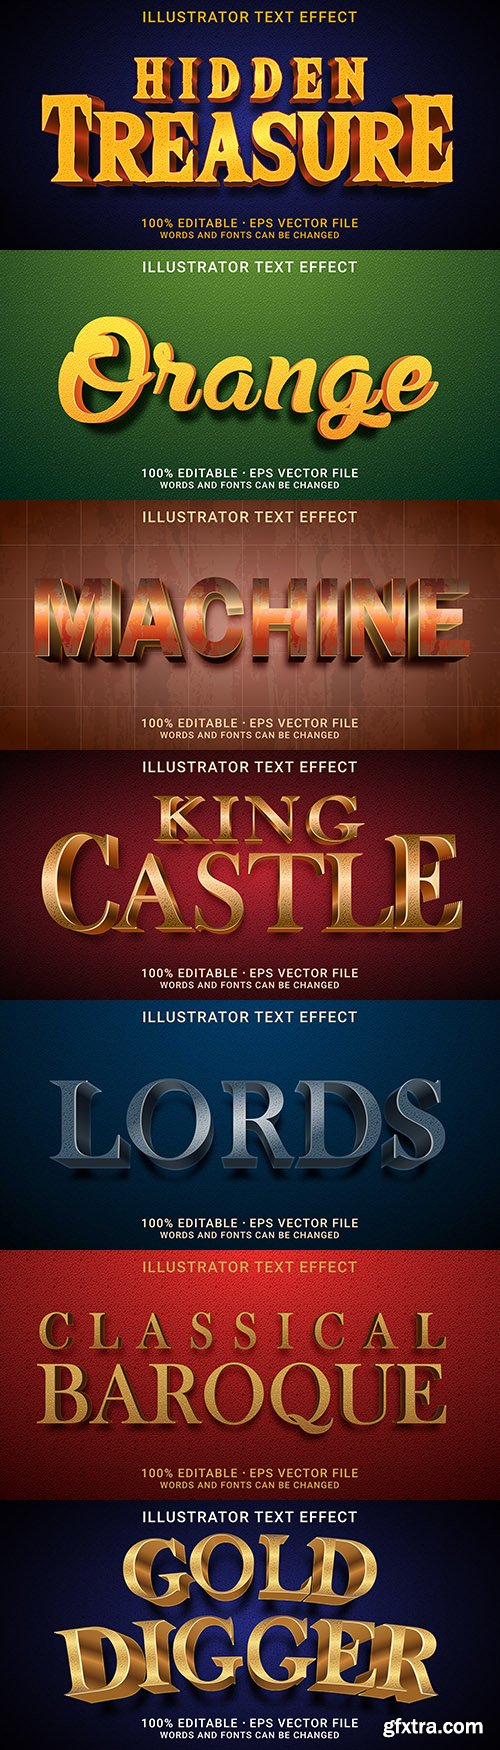 Editable font effect text collection illustration design 207